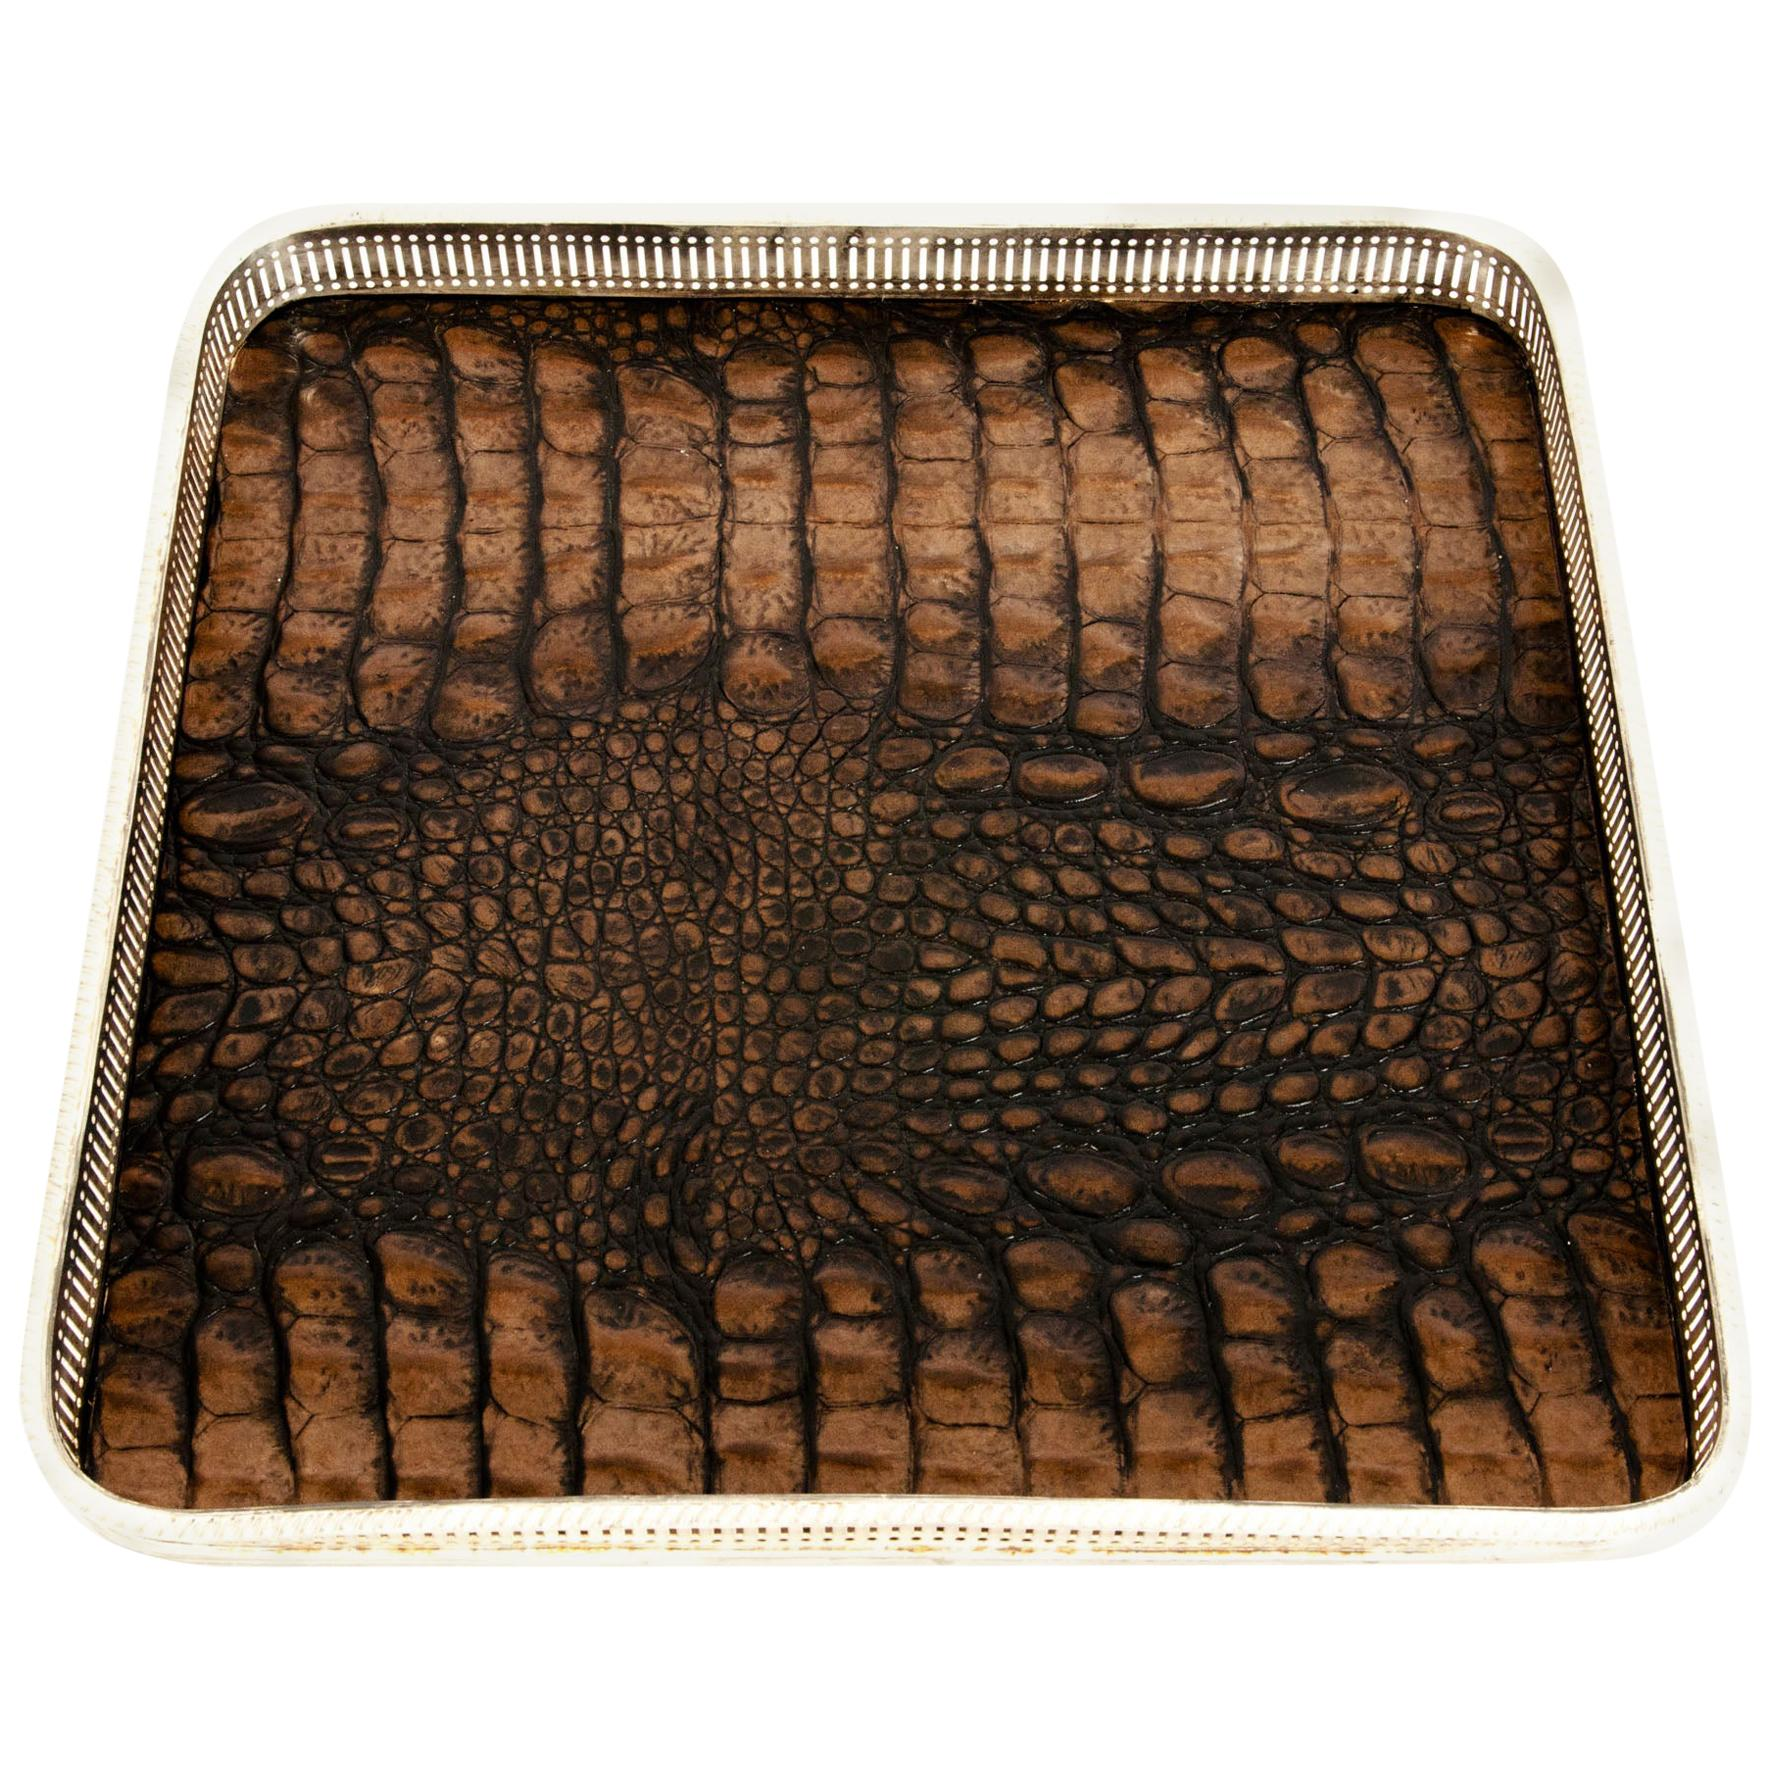 English Sheffield Plated Crocodile Interior Barware Gallery Tray